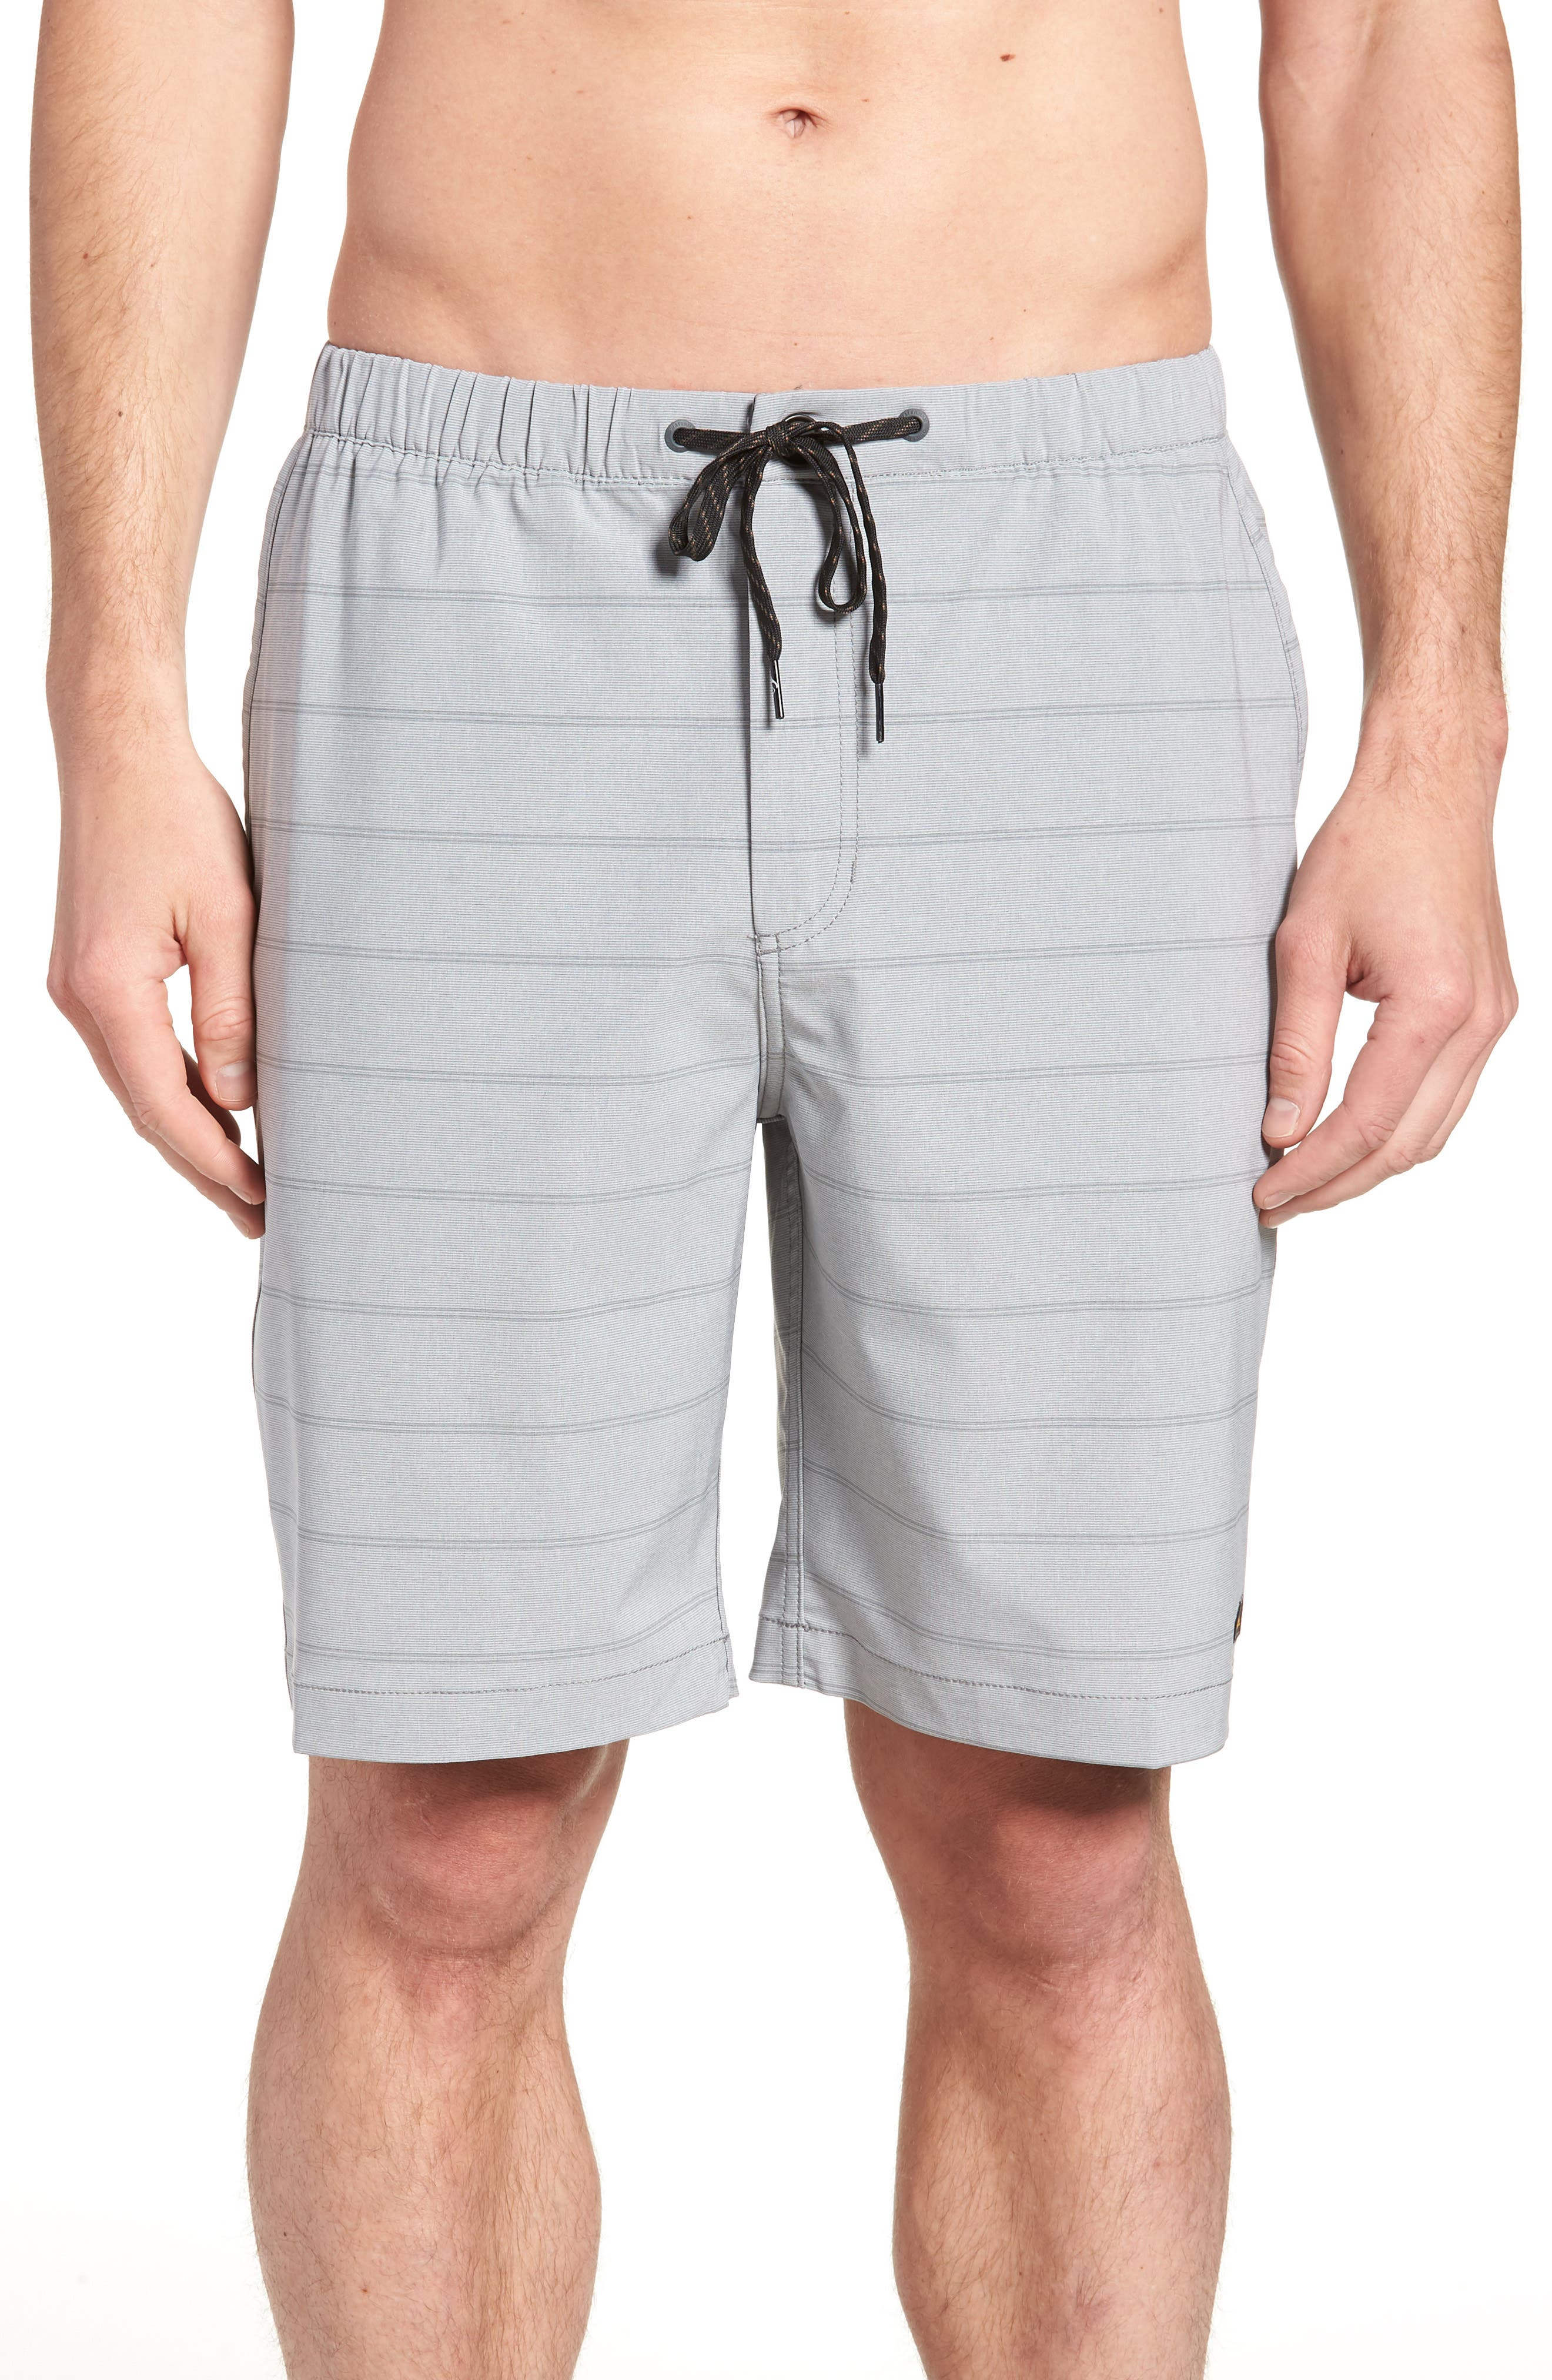 Suva Amphibian Hybrid Shorts,                             Main thumbnail 1, color,                             STEEPLE GRAY